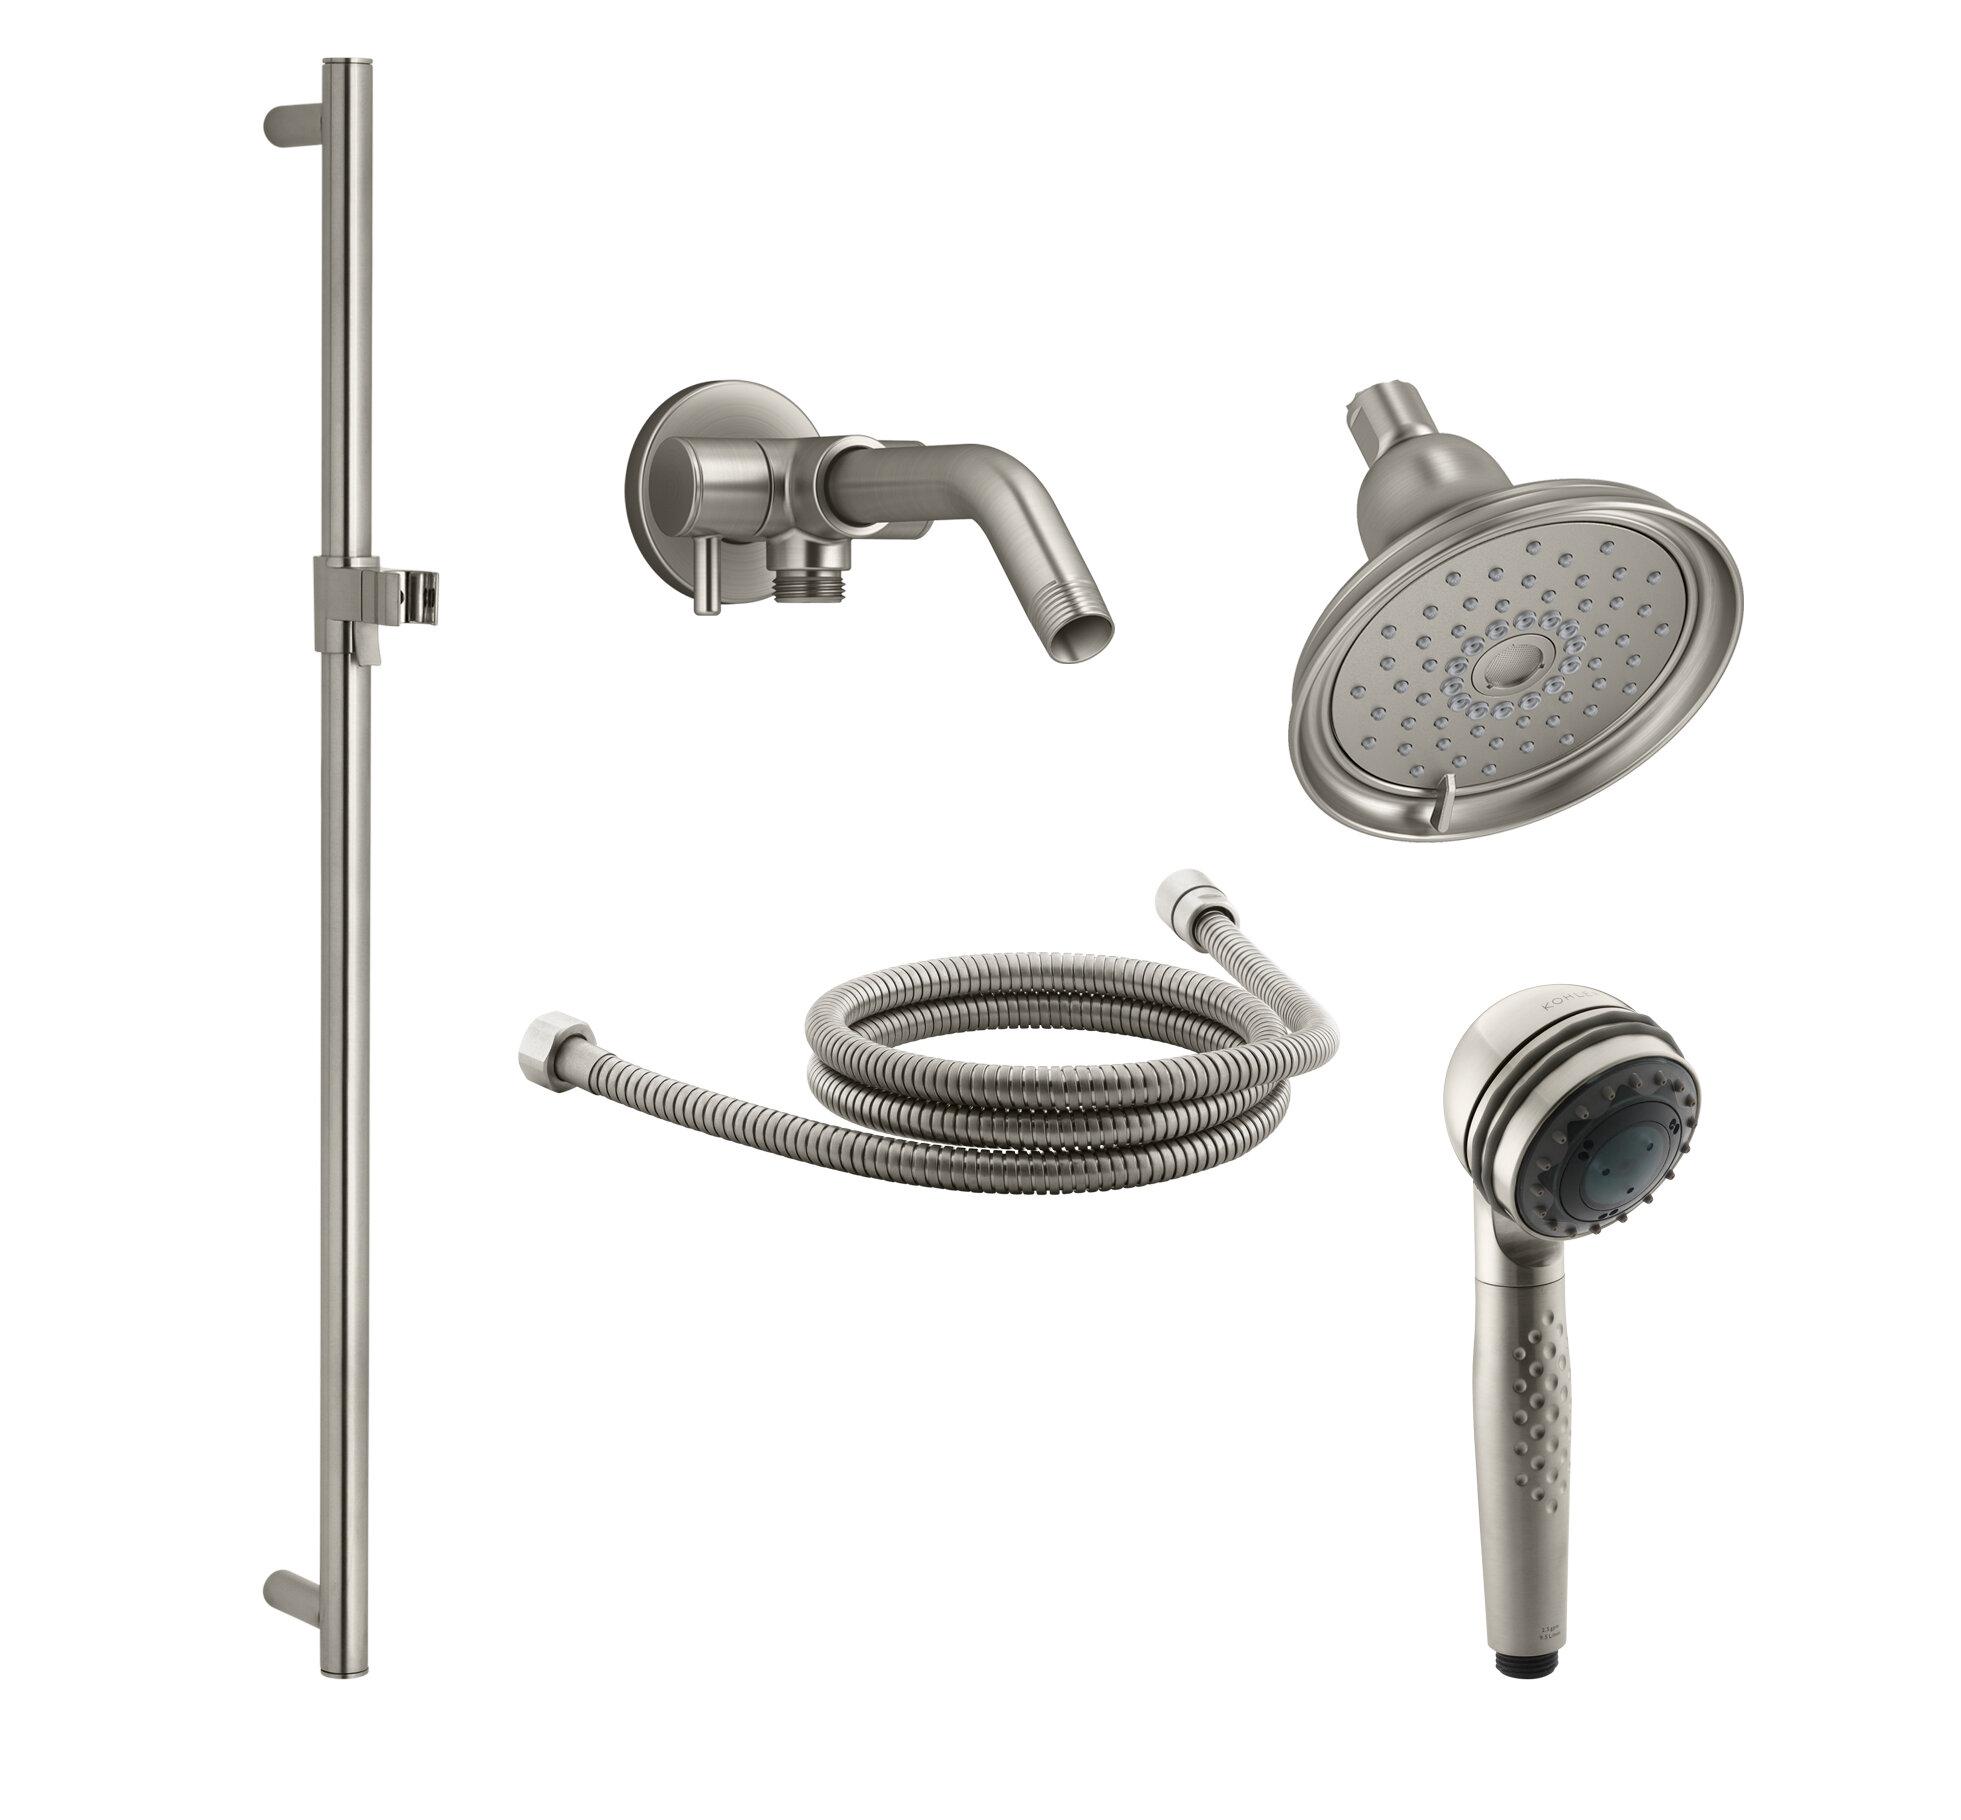 Kohler Bancroft Showering Kit With Multi Function Handshower And Shower Arm Diverter